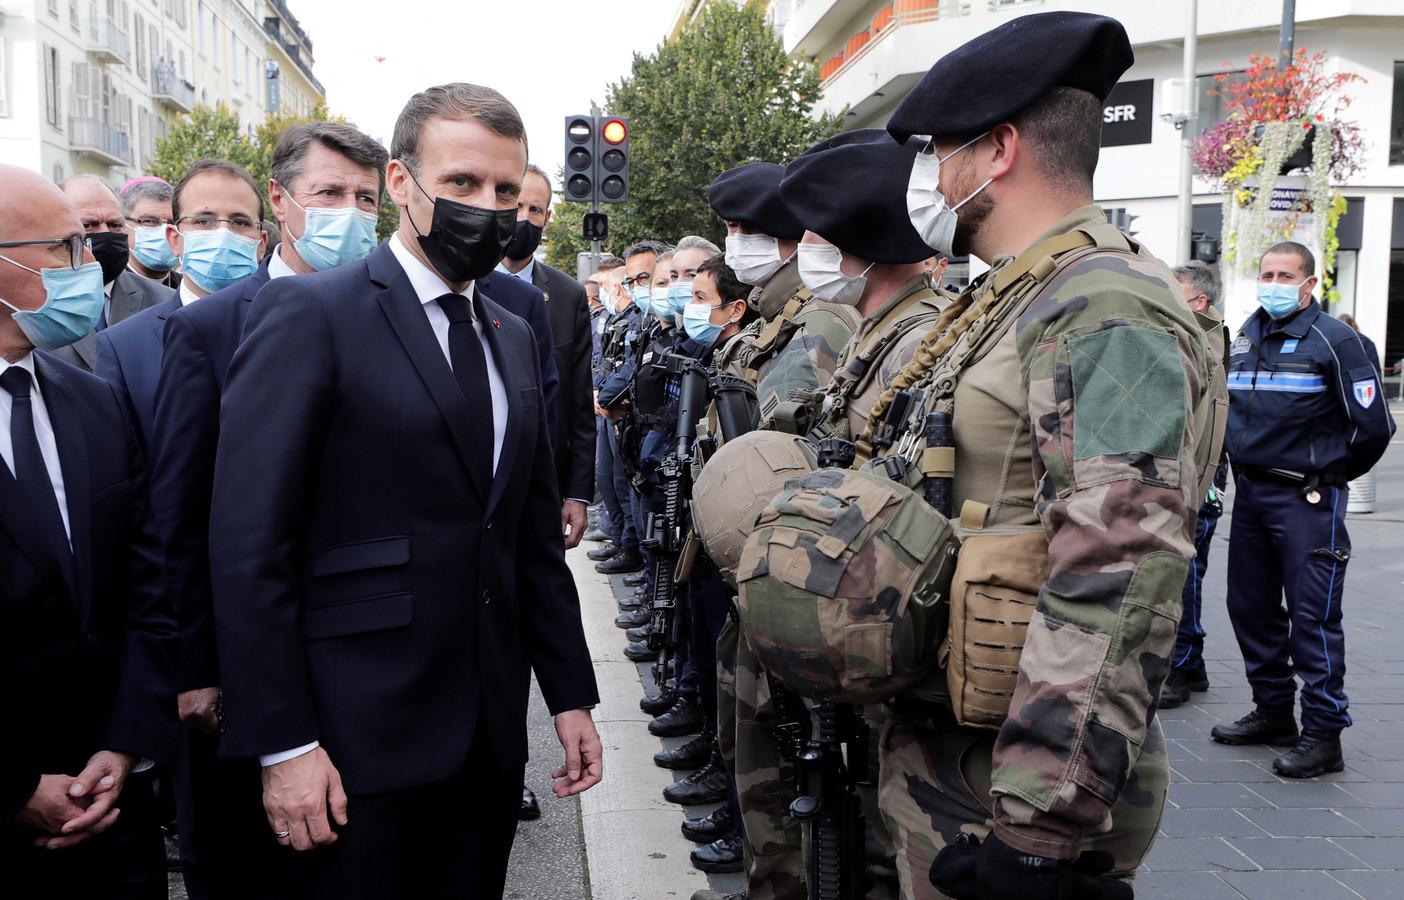 President Macron in Nice.